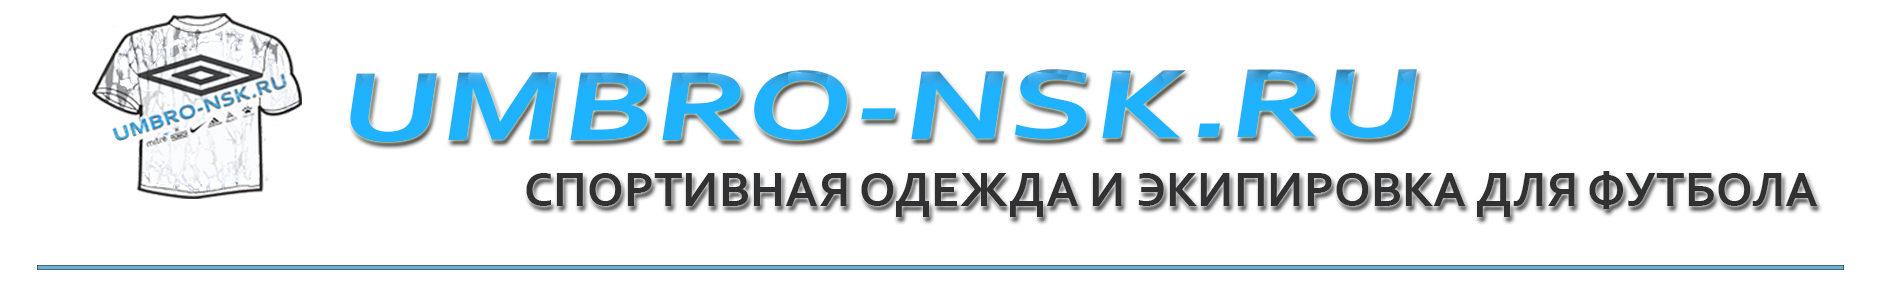 umbro-nsk.ru